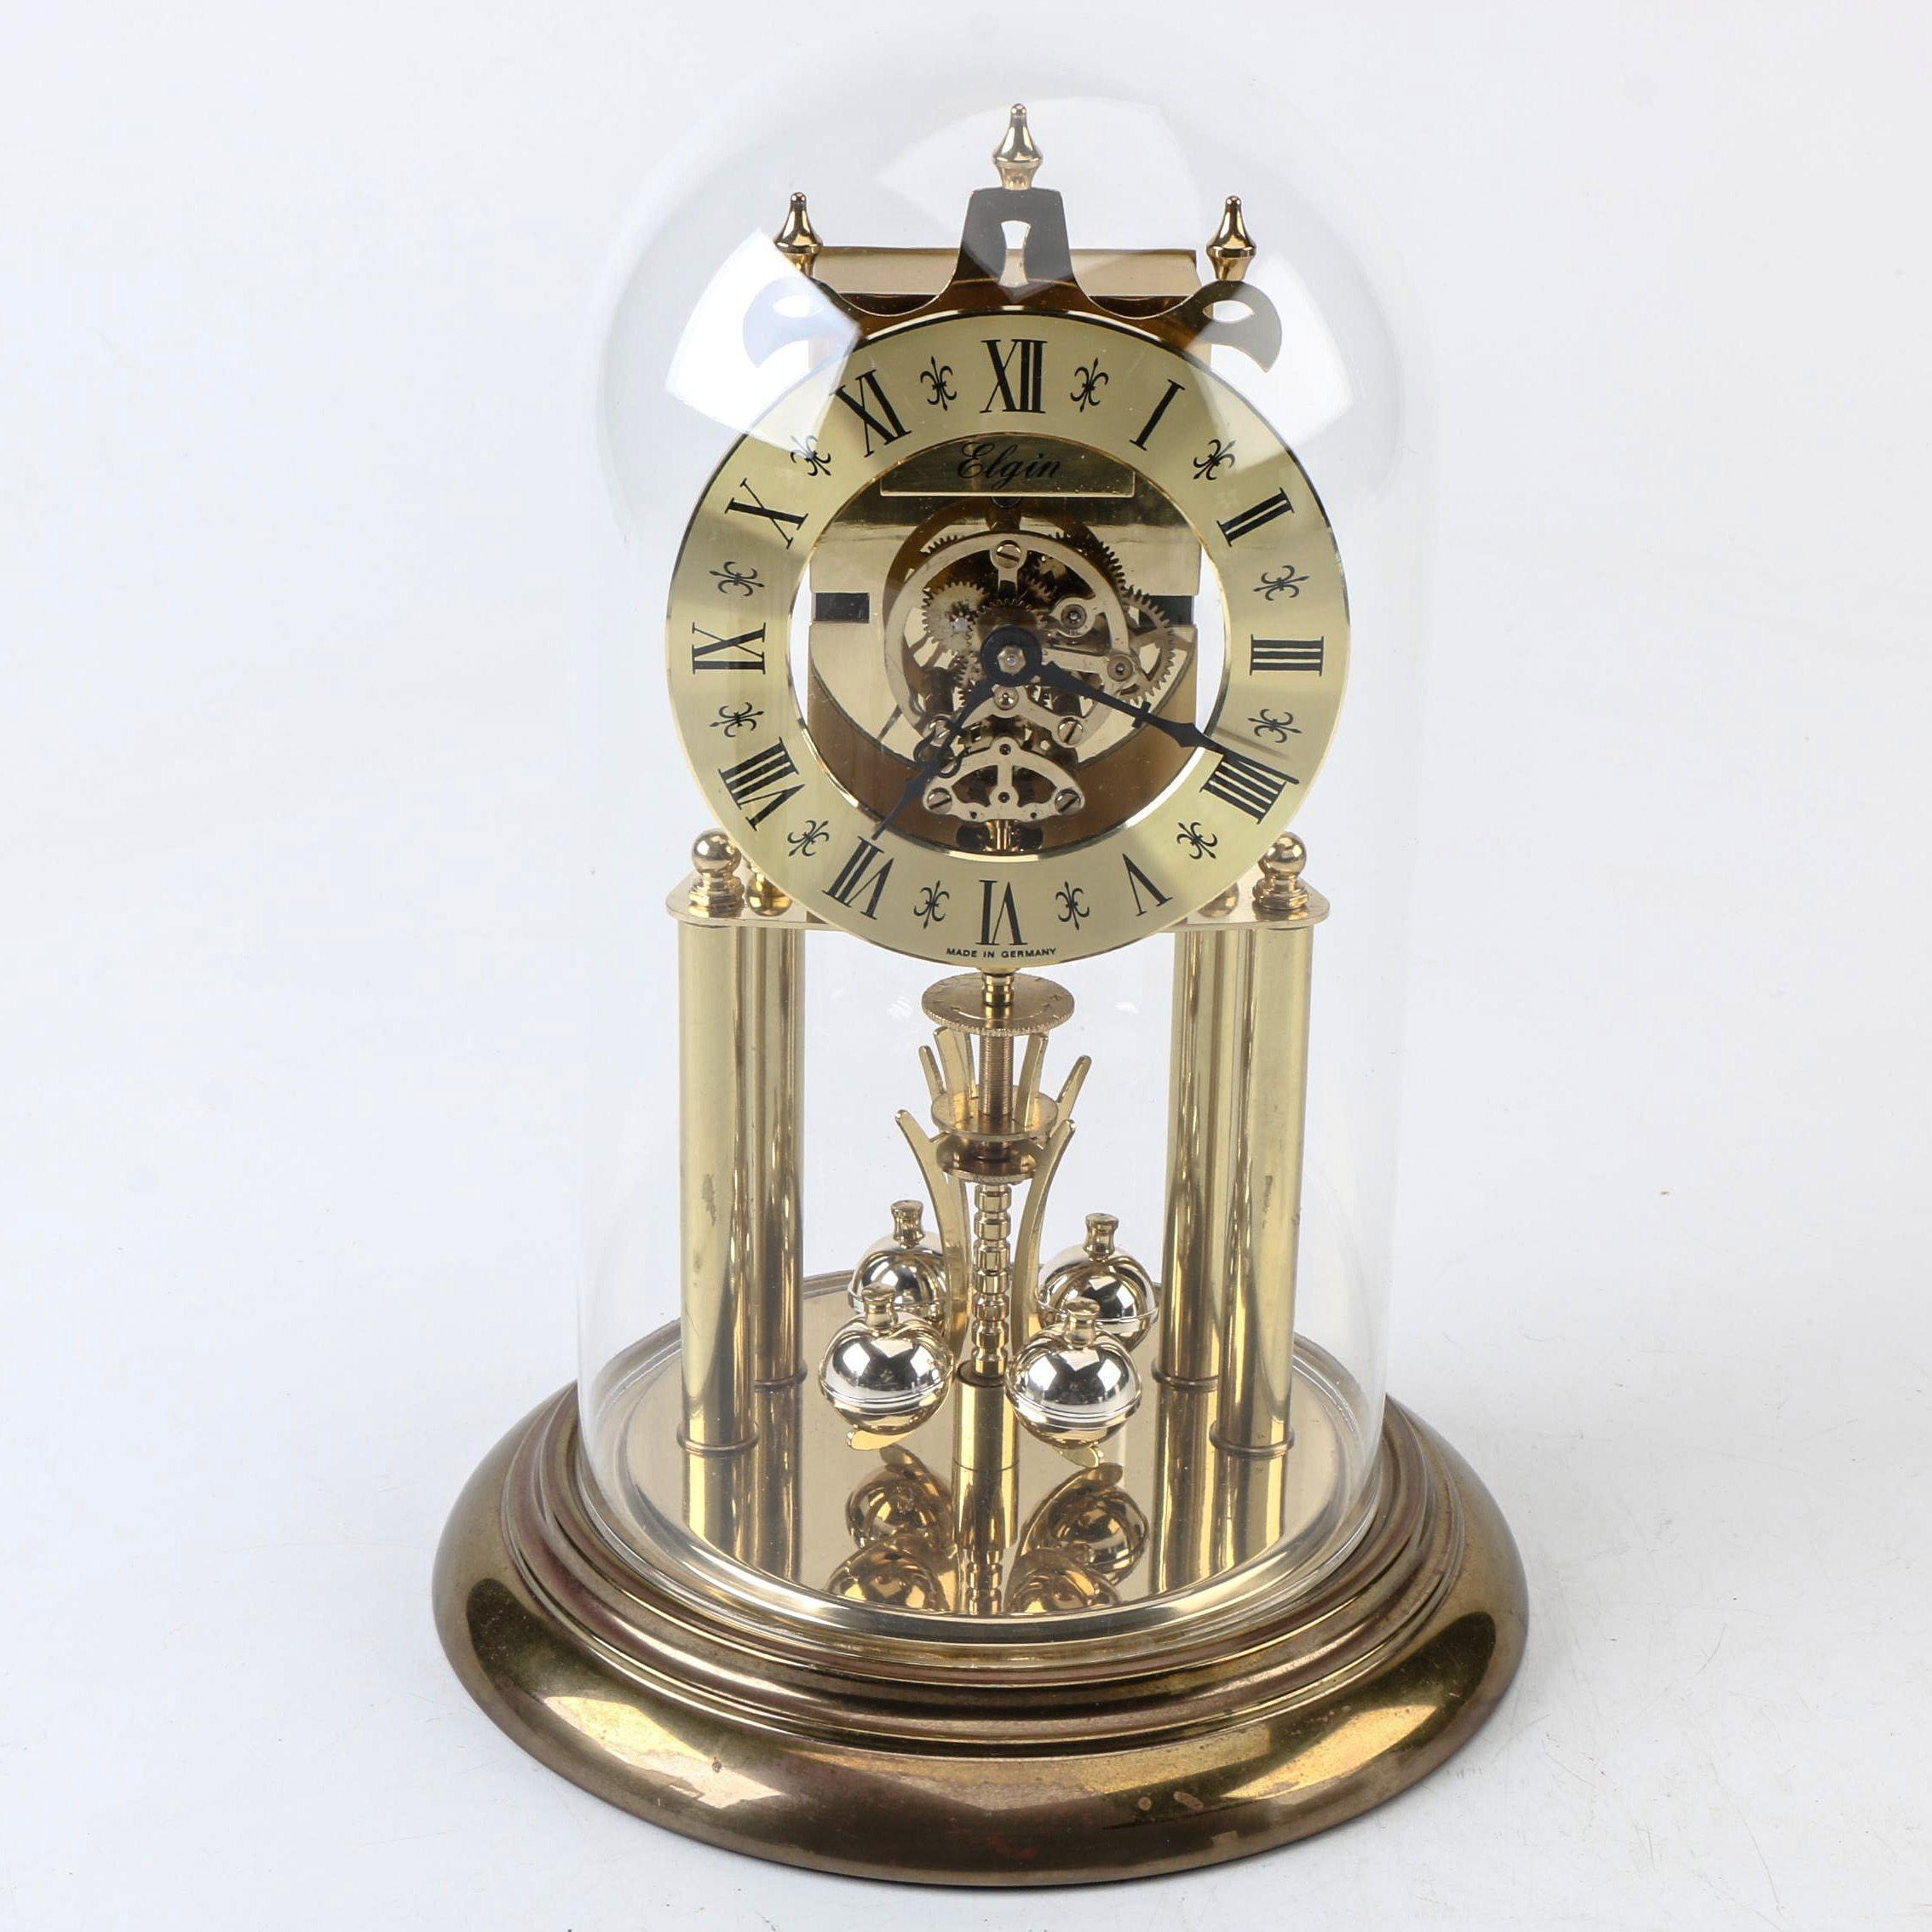 Elgin 400 Day Anniversary Clock